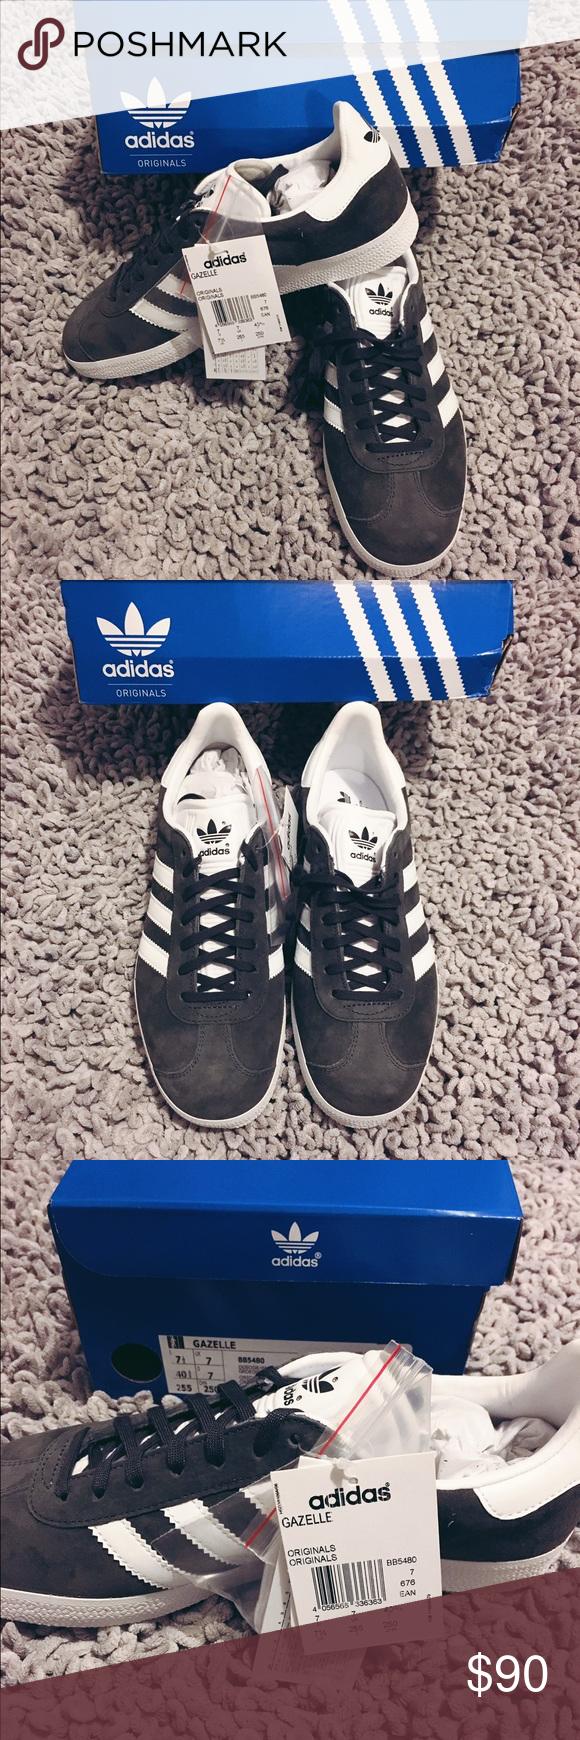 Adidas Gazzella Scarpe E Nwt Adidas Gazzella, Camoscio E Scarpe Scarpe Da Ginnastica Adidas 10be73